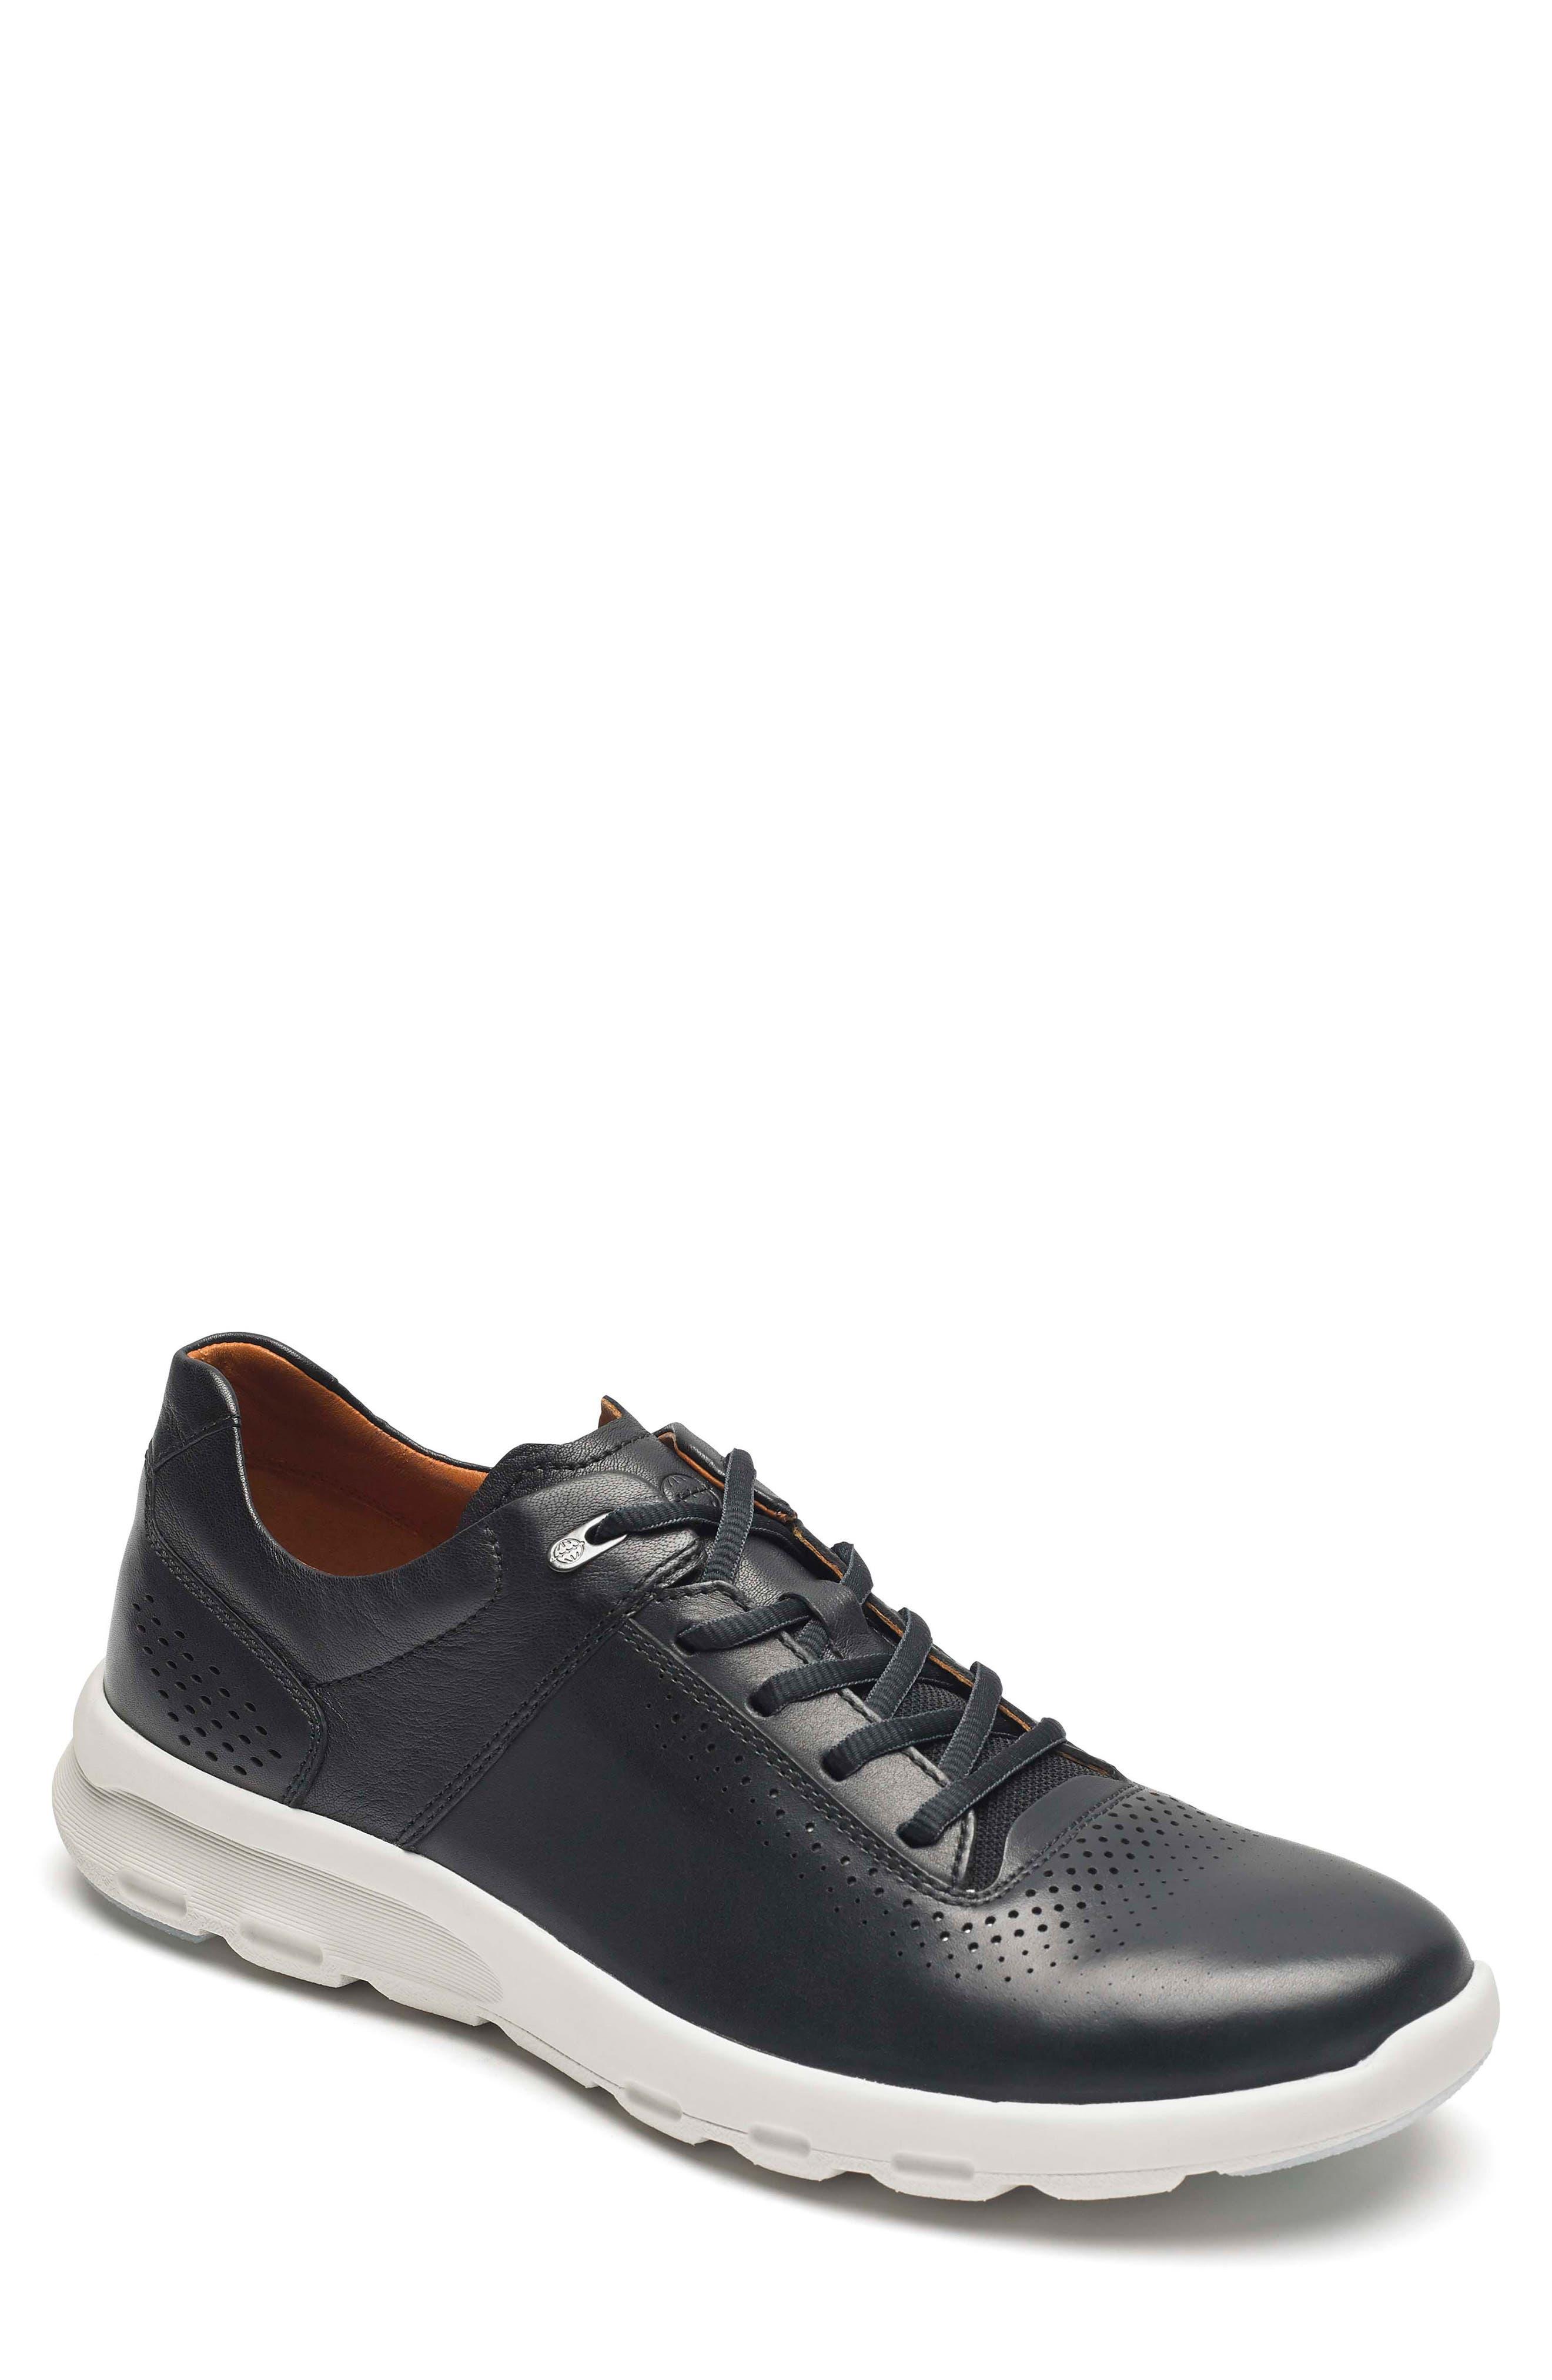 Let's Walk<sup>®</sup> Sneaker,                             Main thumbnail 1, color,                             BLACK LEATHER